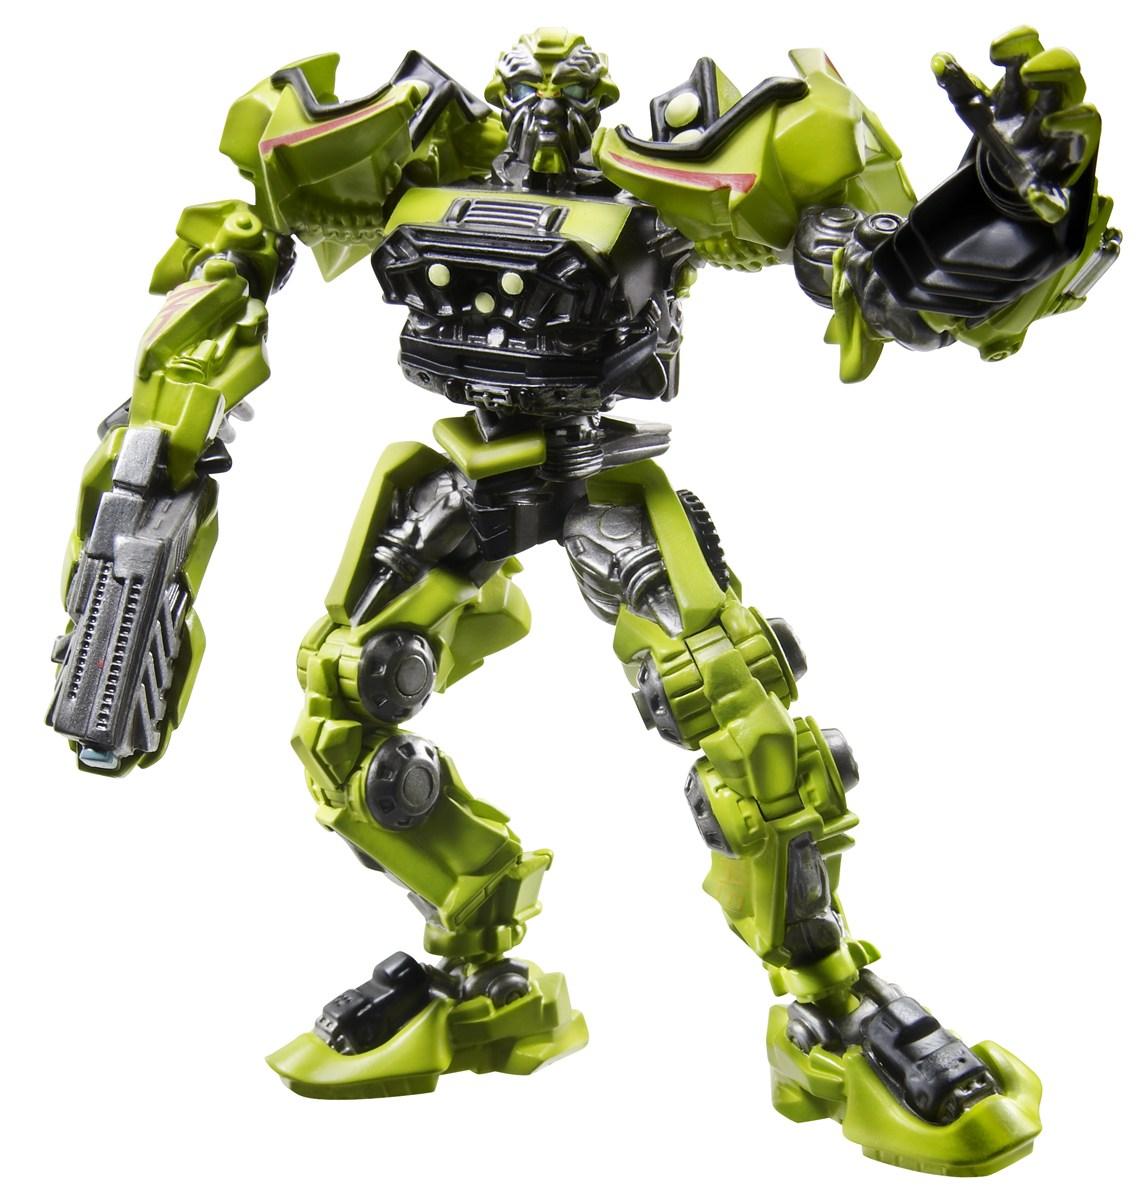 Toy Fair 09 Round Up: ROTF Robot Replicas - Transformers ...